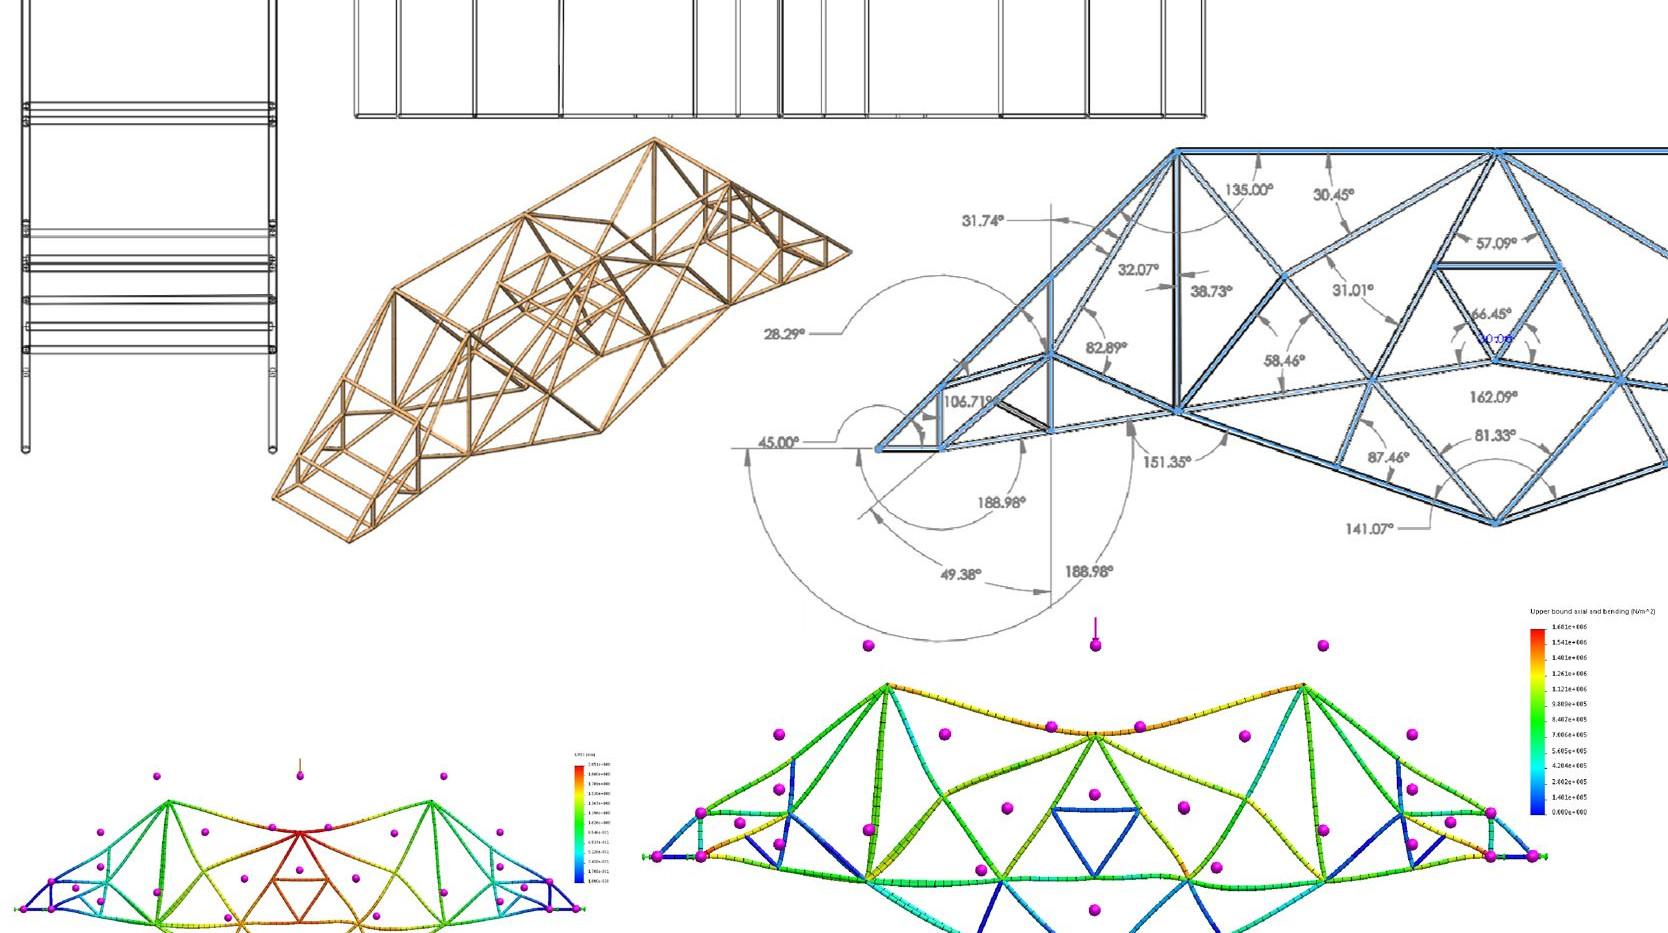 Basic physics simulations